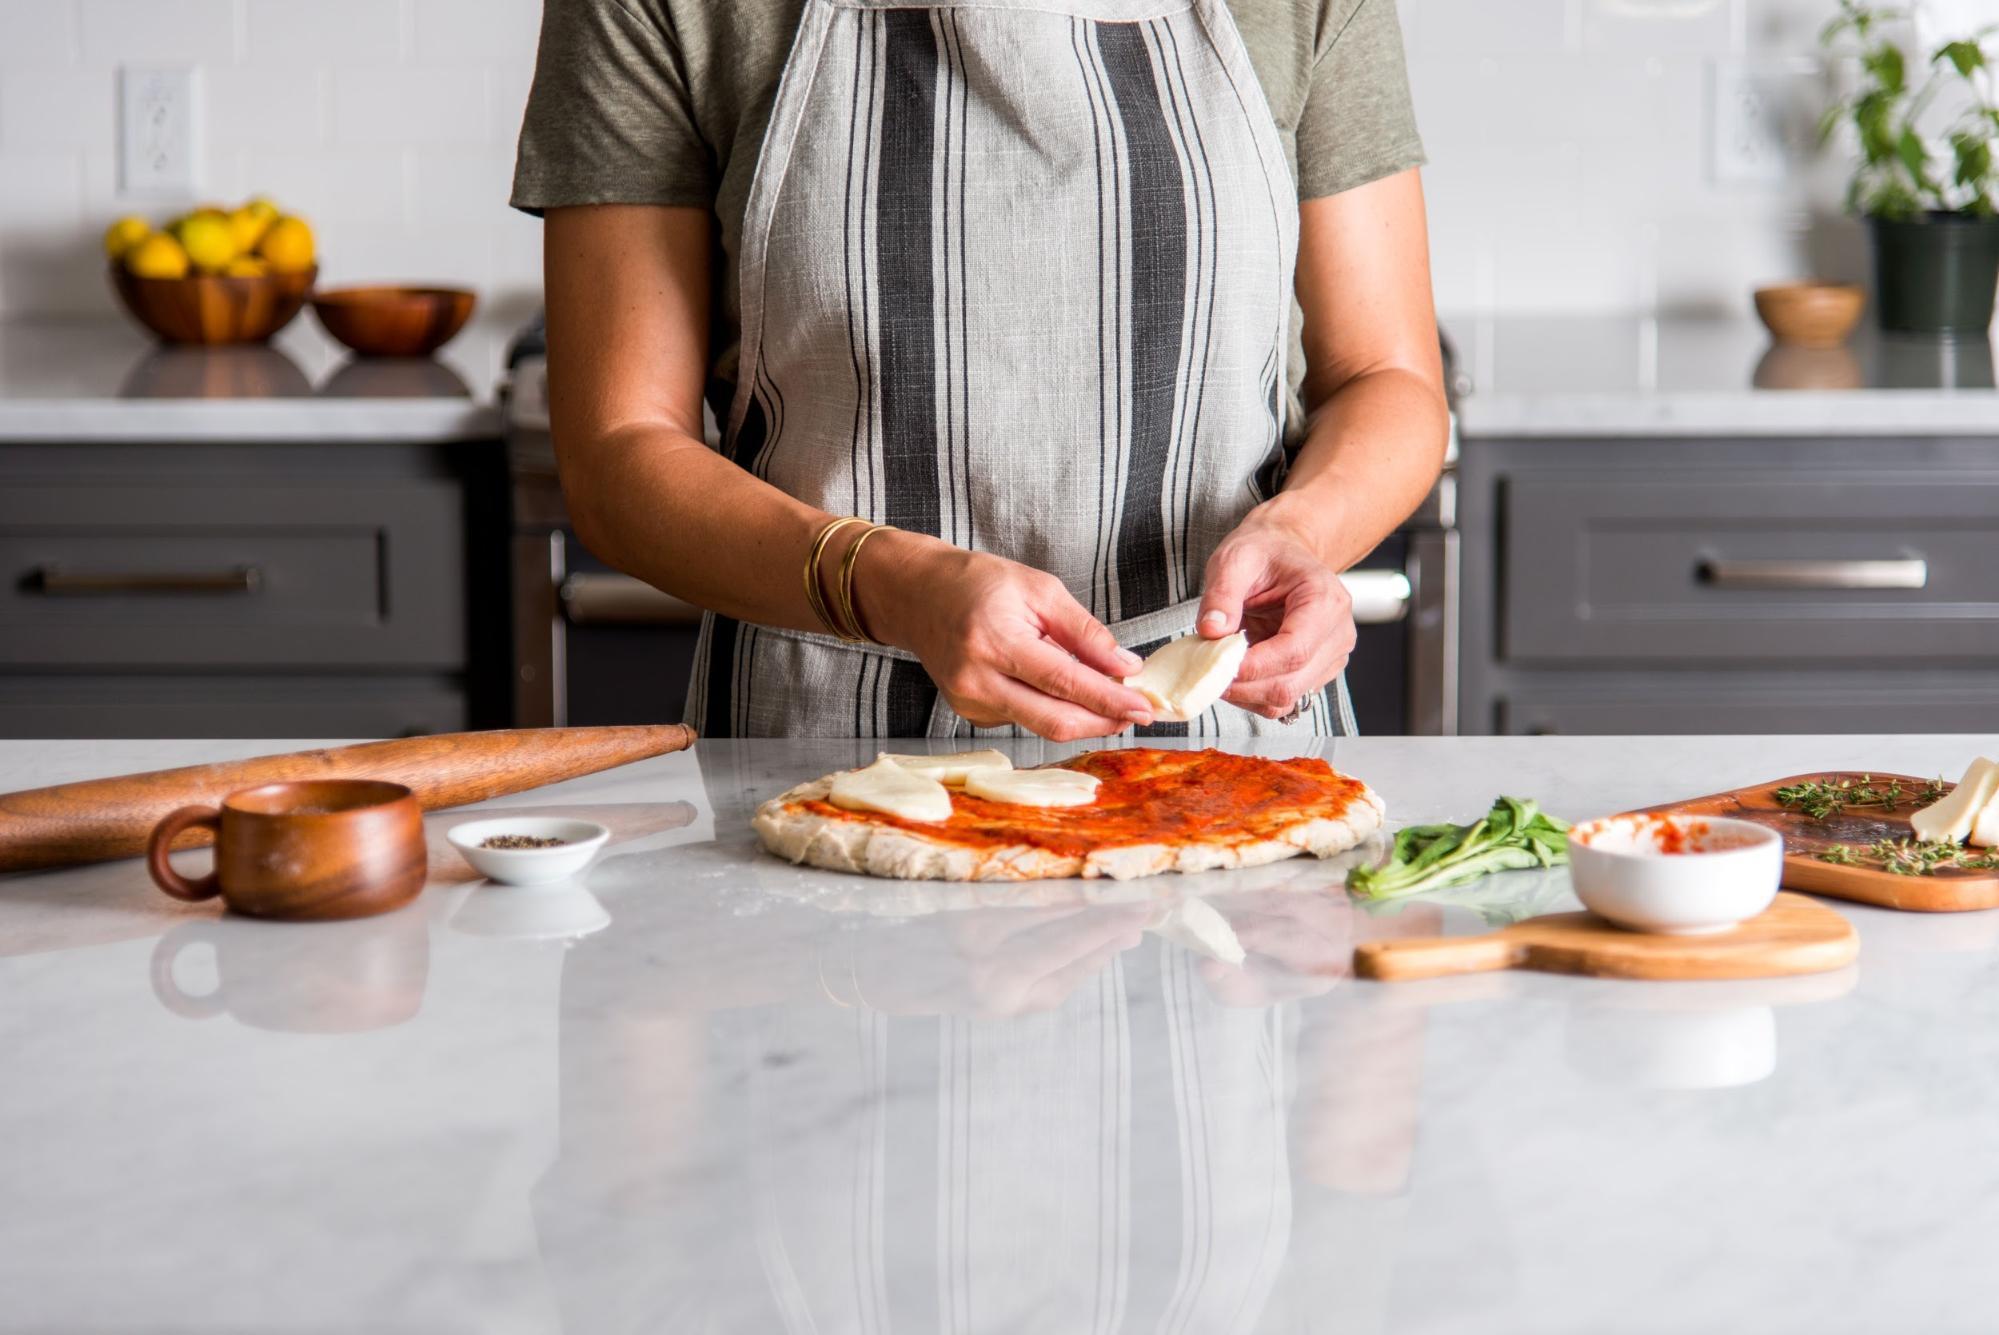 Joanna Gaines making pizza